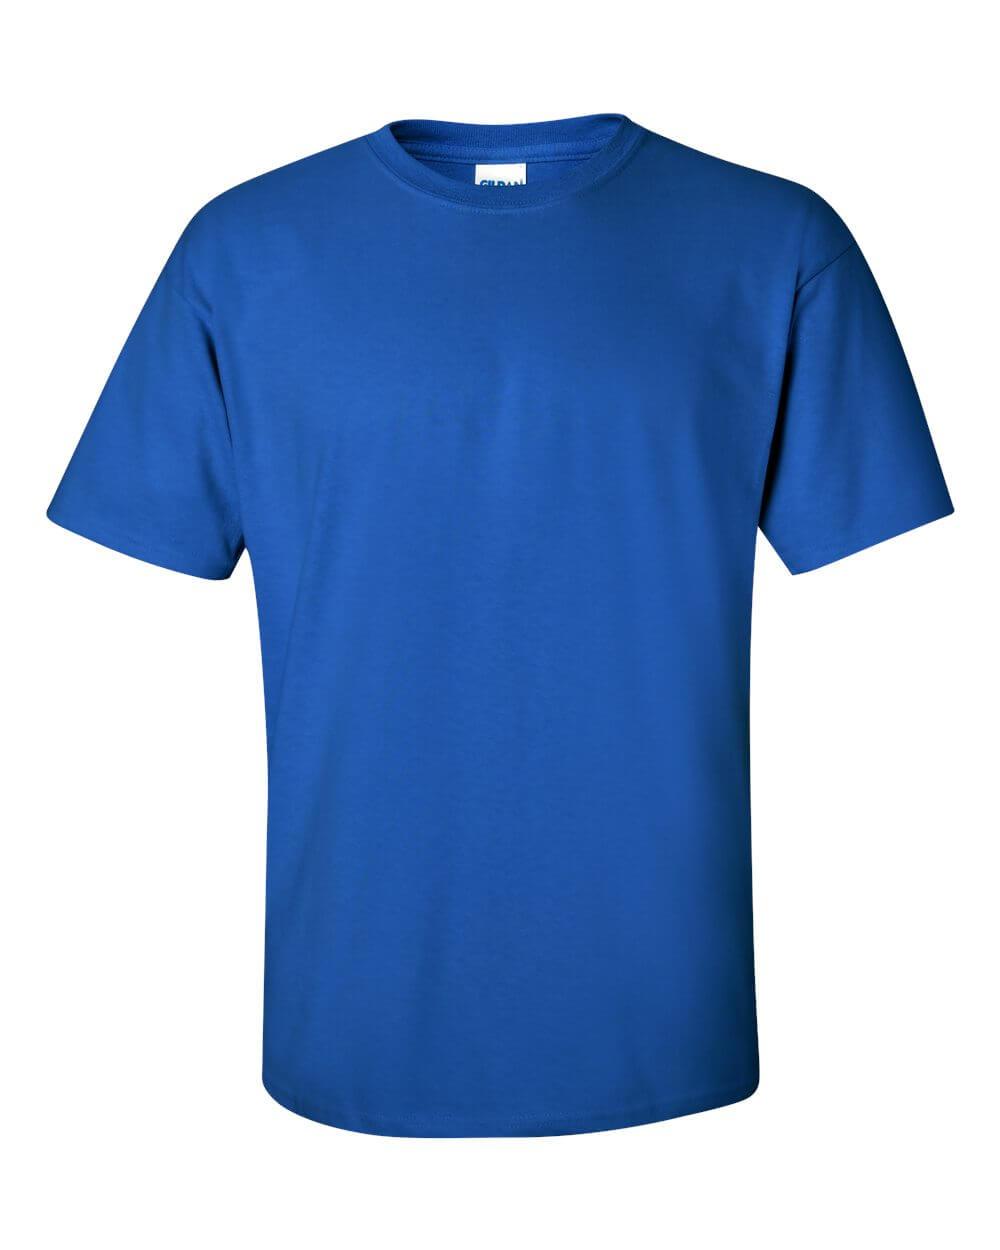 Gildan_2000_Royal Blue Custom T Shirts